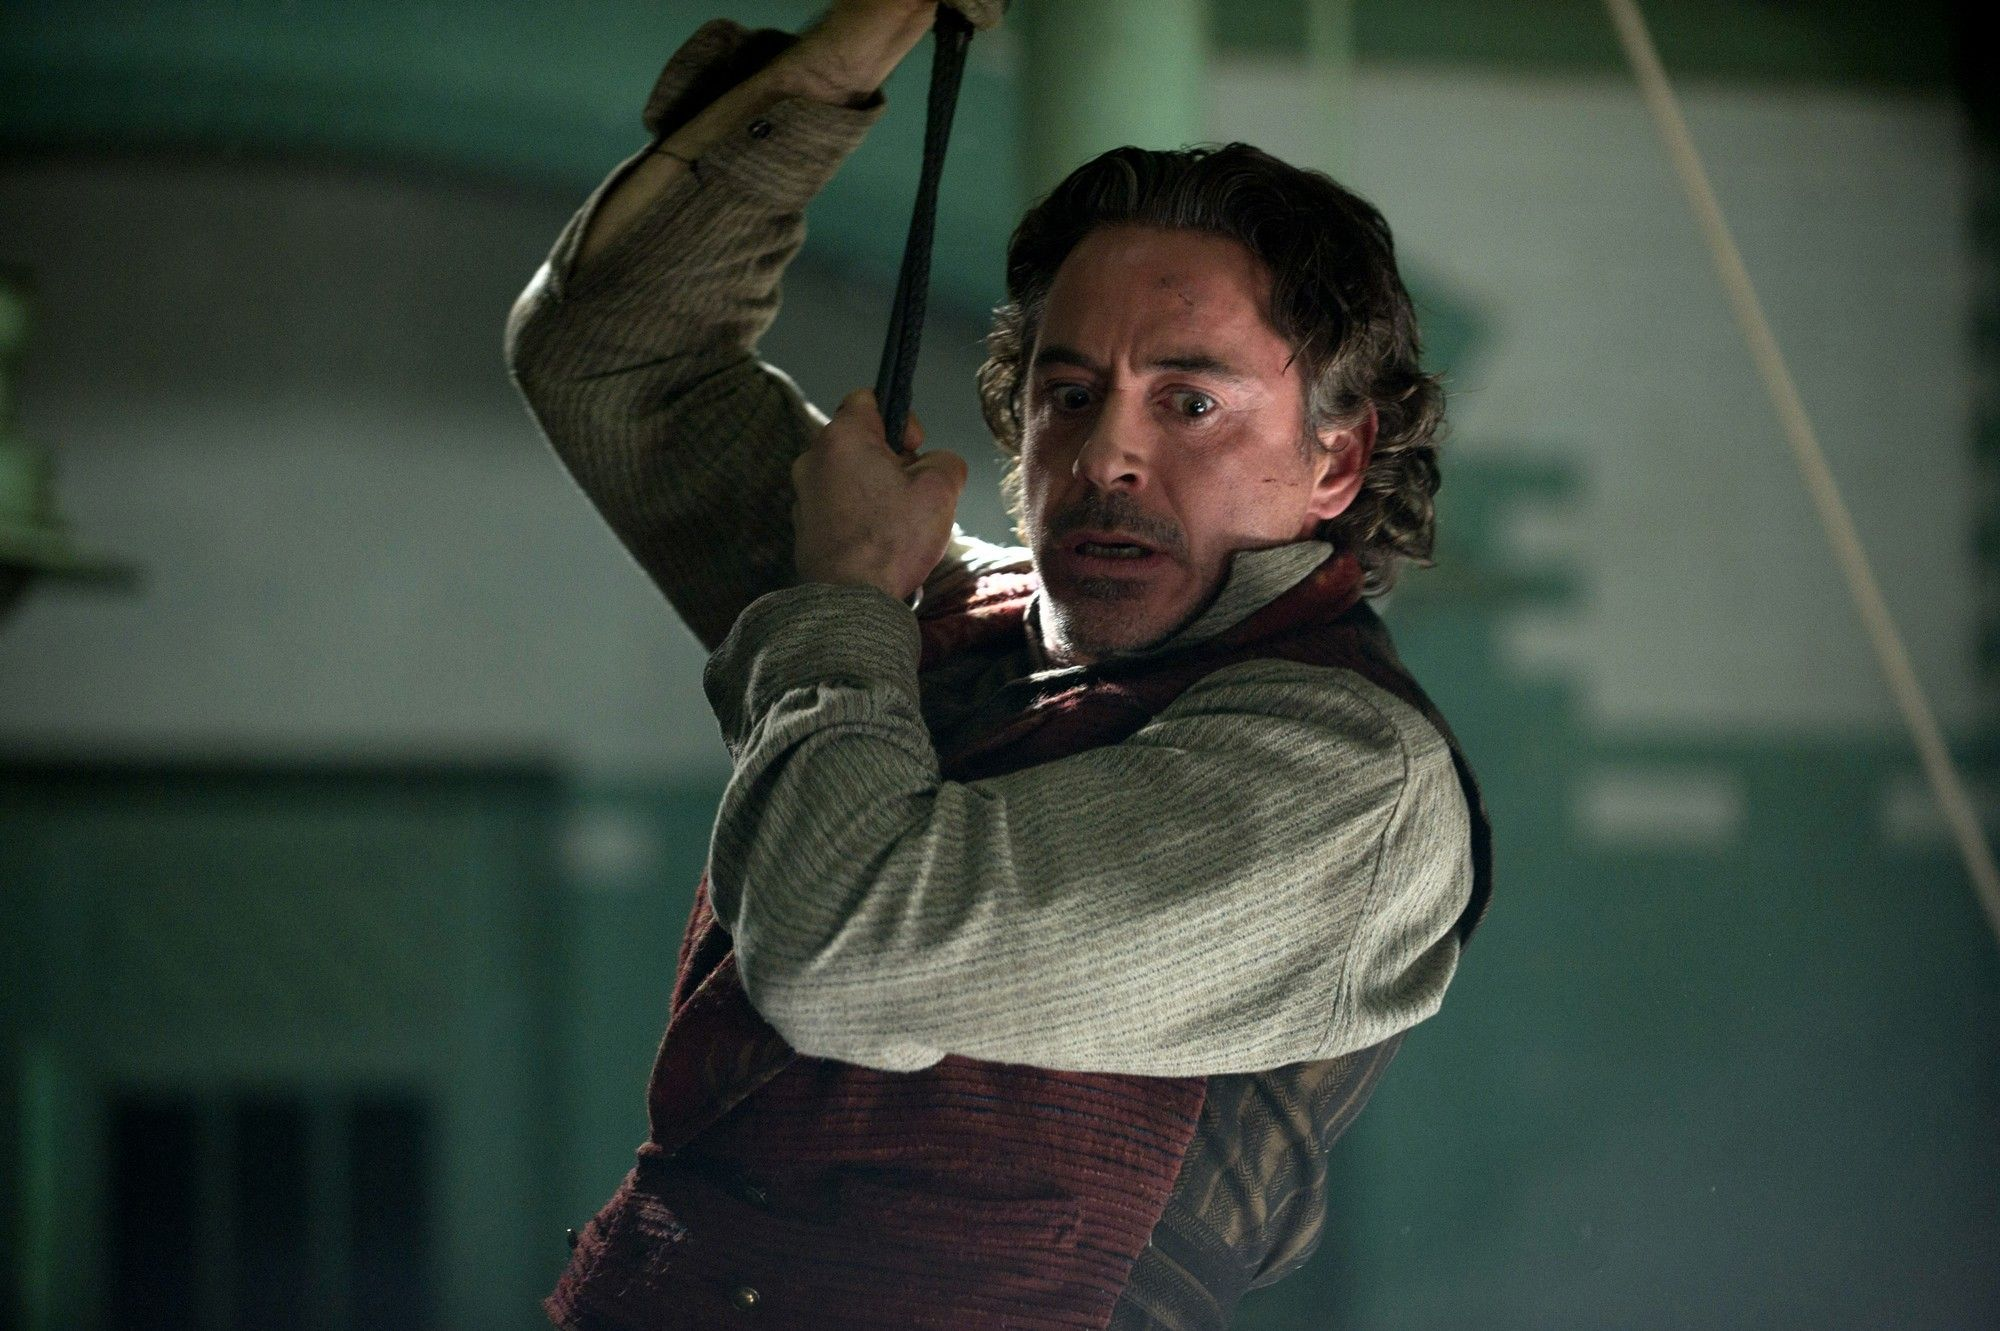 Sherlock Holmes 3 Happening Soon Says Robert Downey Jr Collider